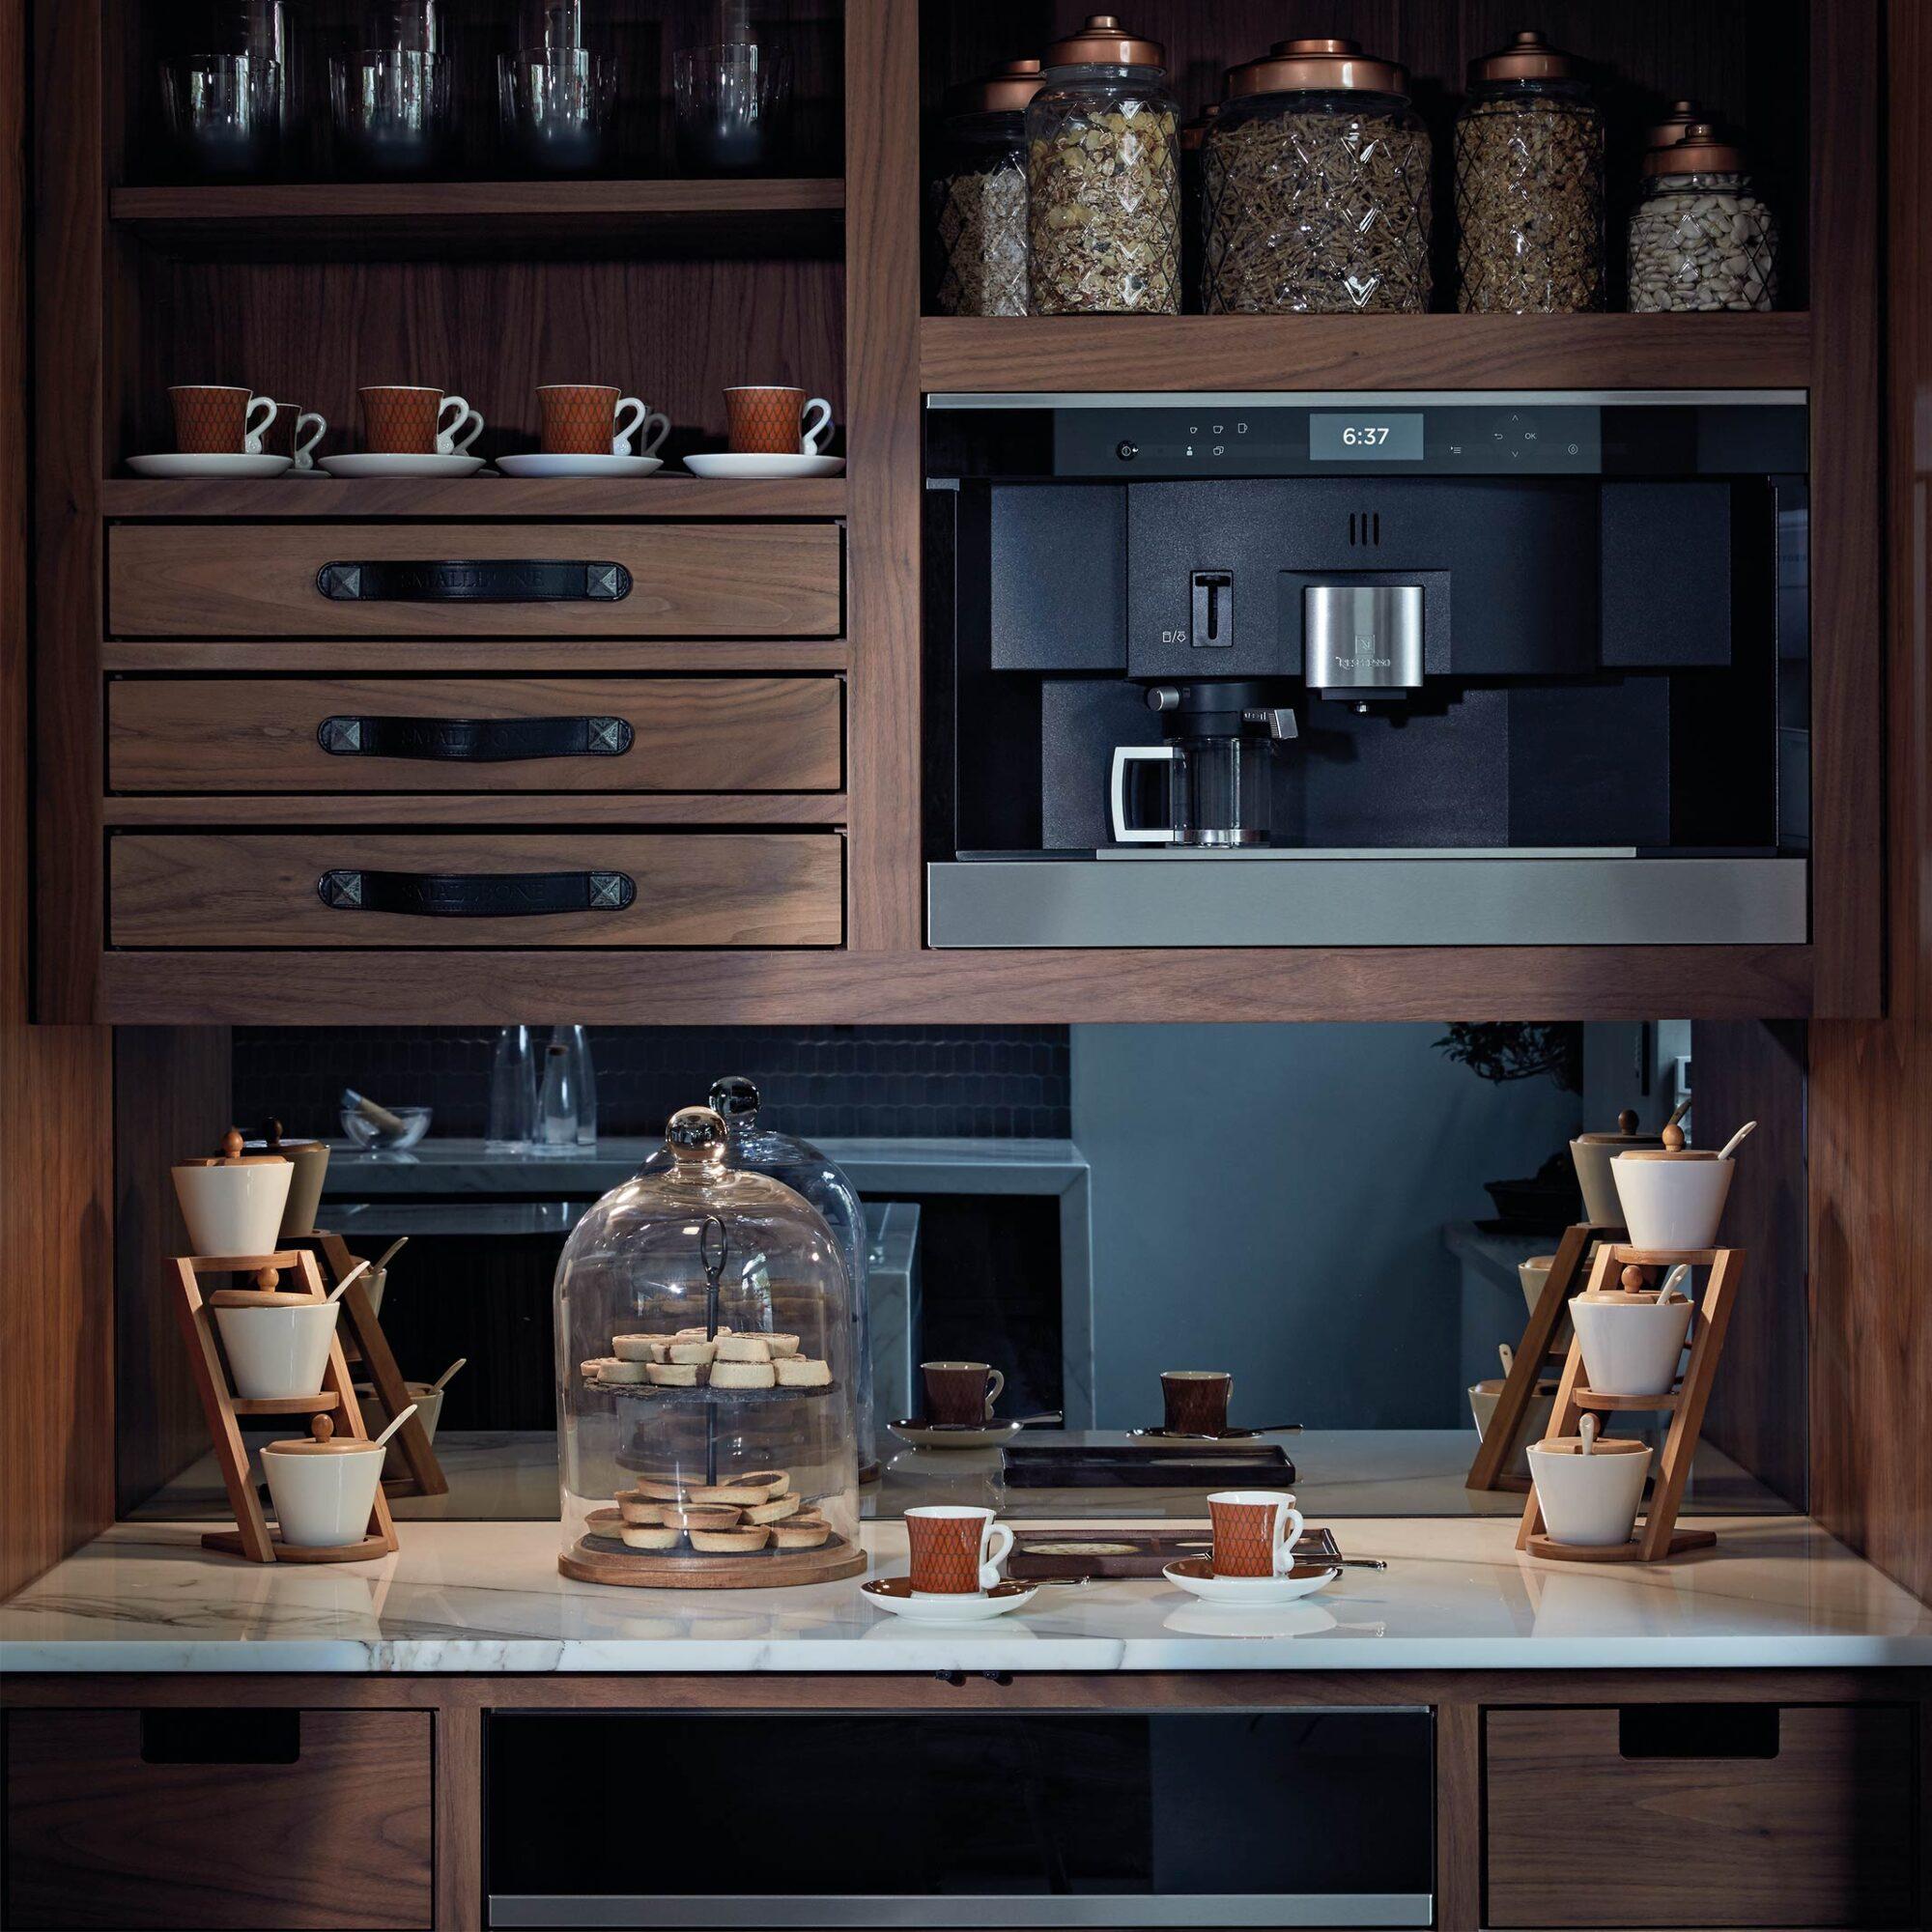 A Smallbone Mulberry design kitchen cupboard